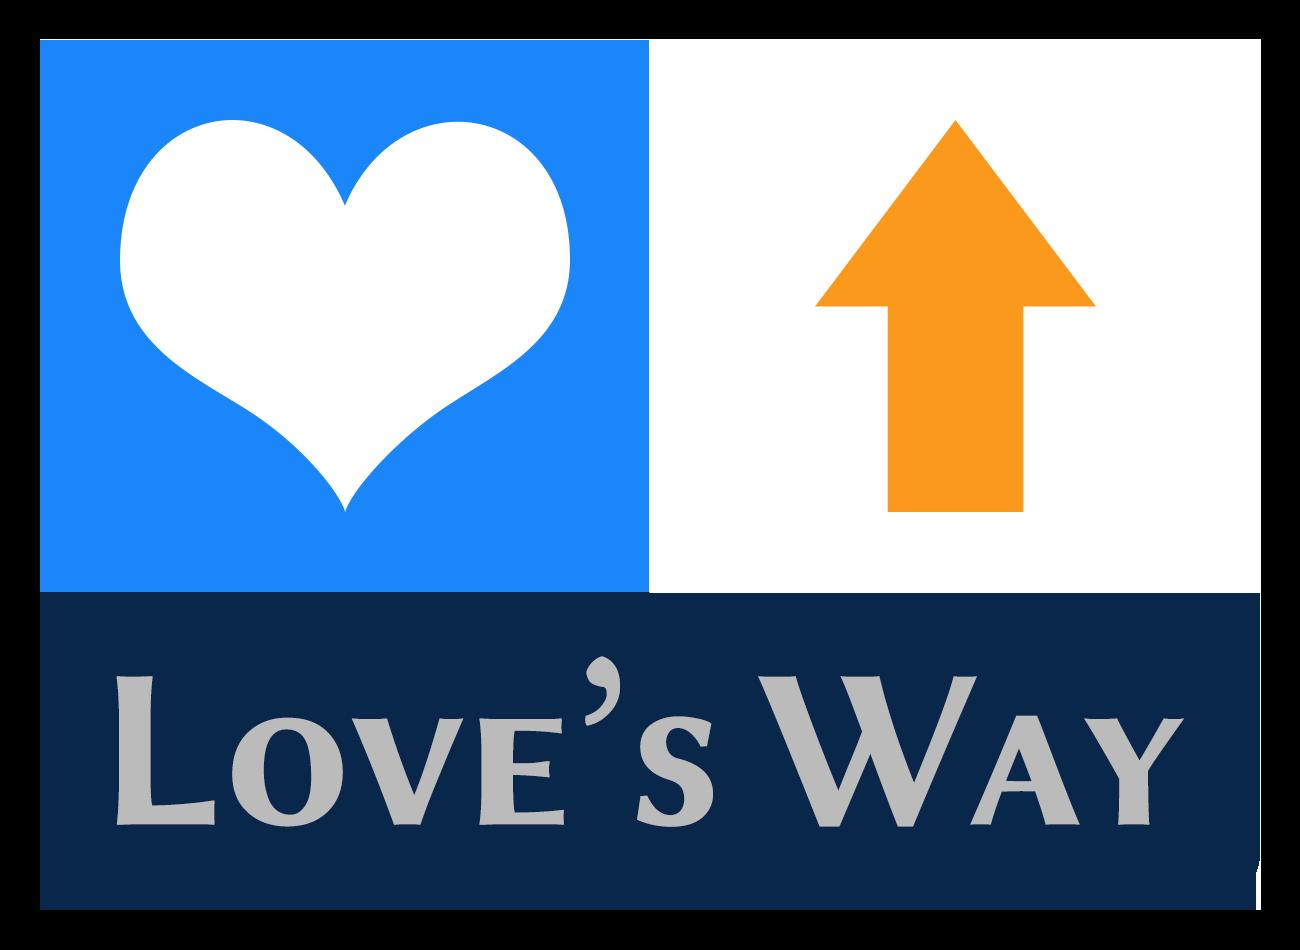 Love's Way